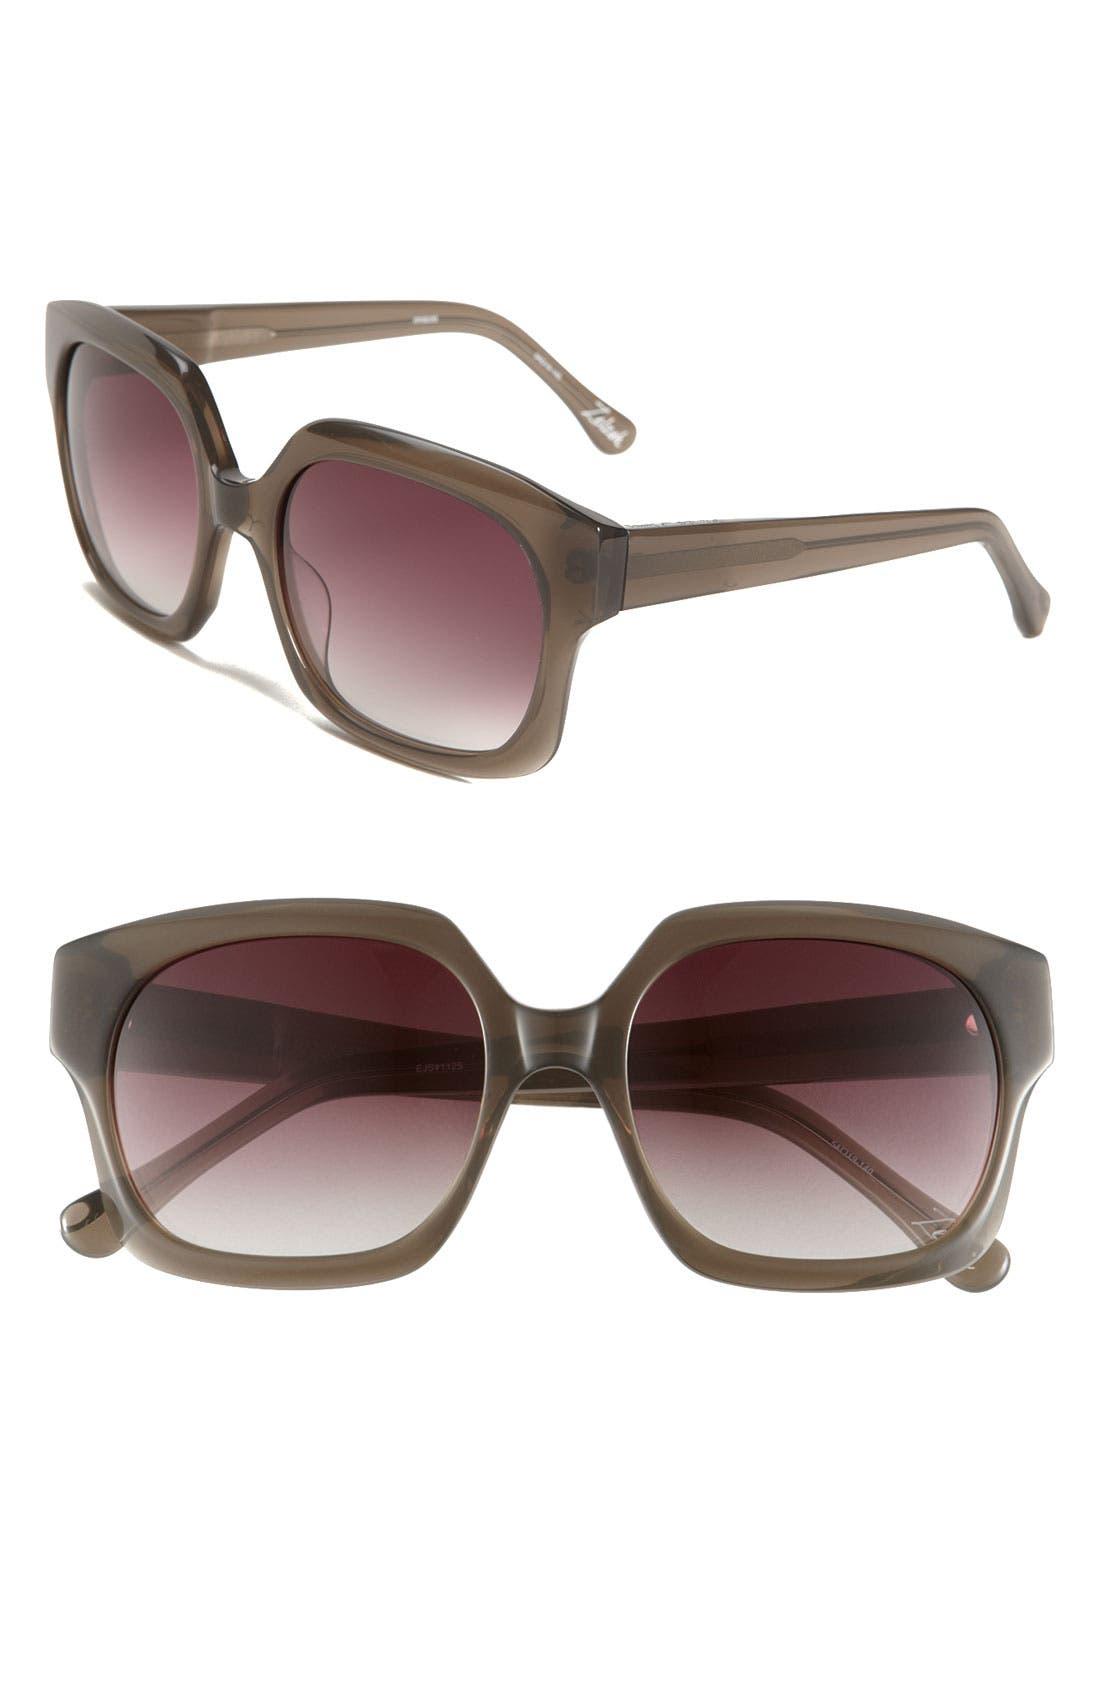 Main Image - Elizabeth and James 'Zelzah' Sunglasses